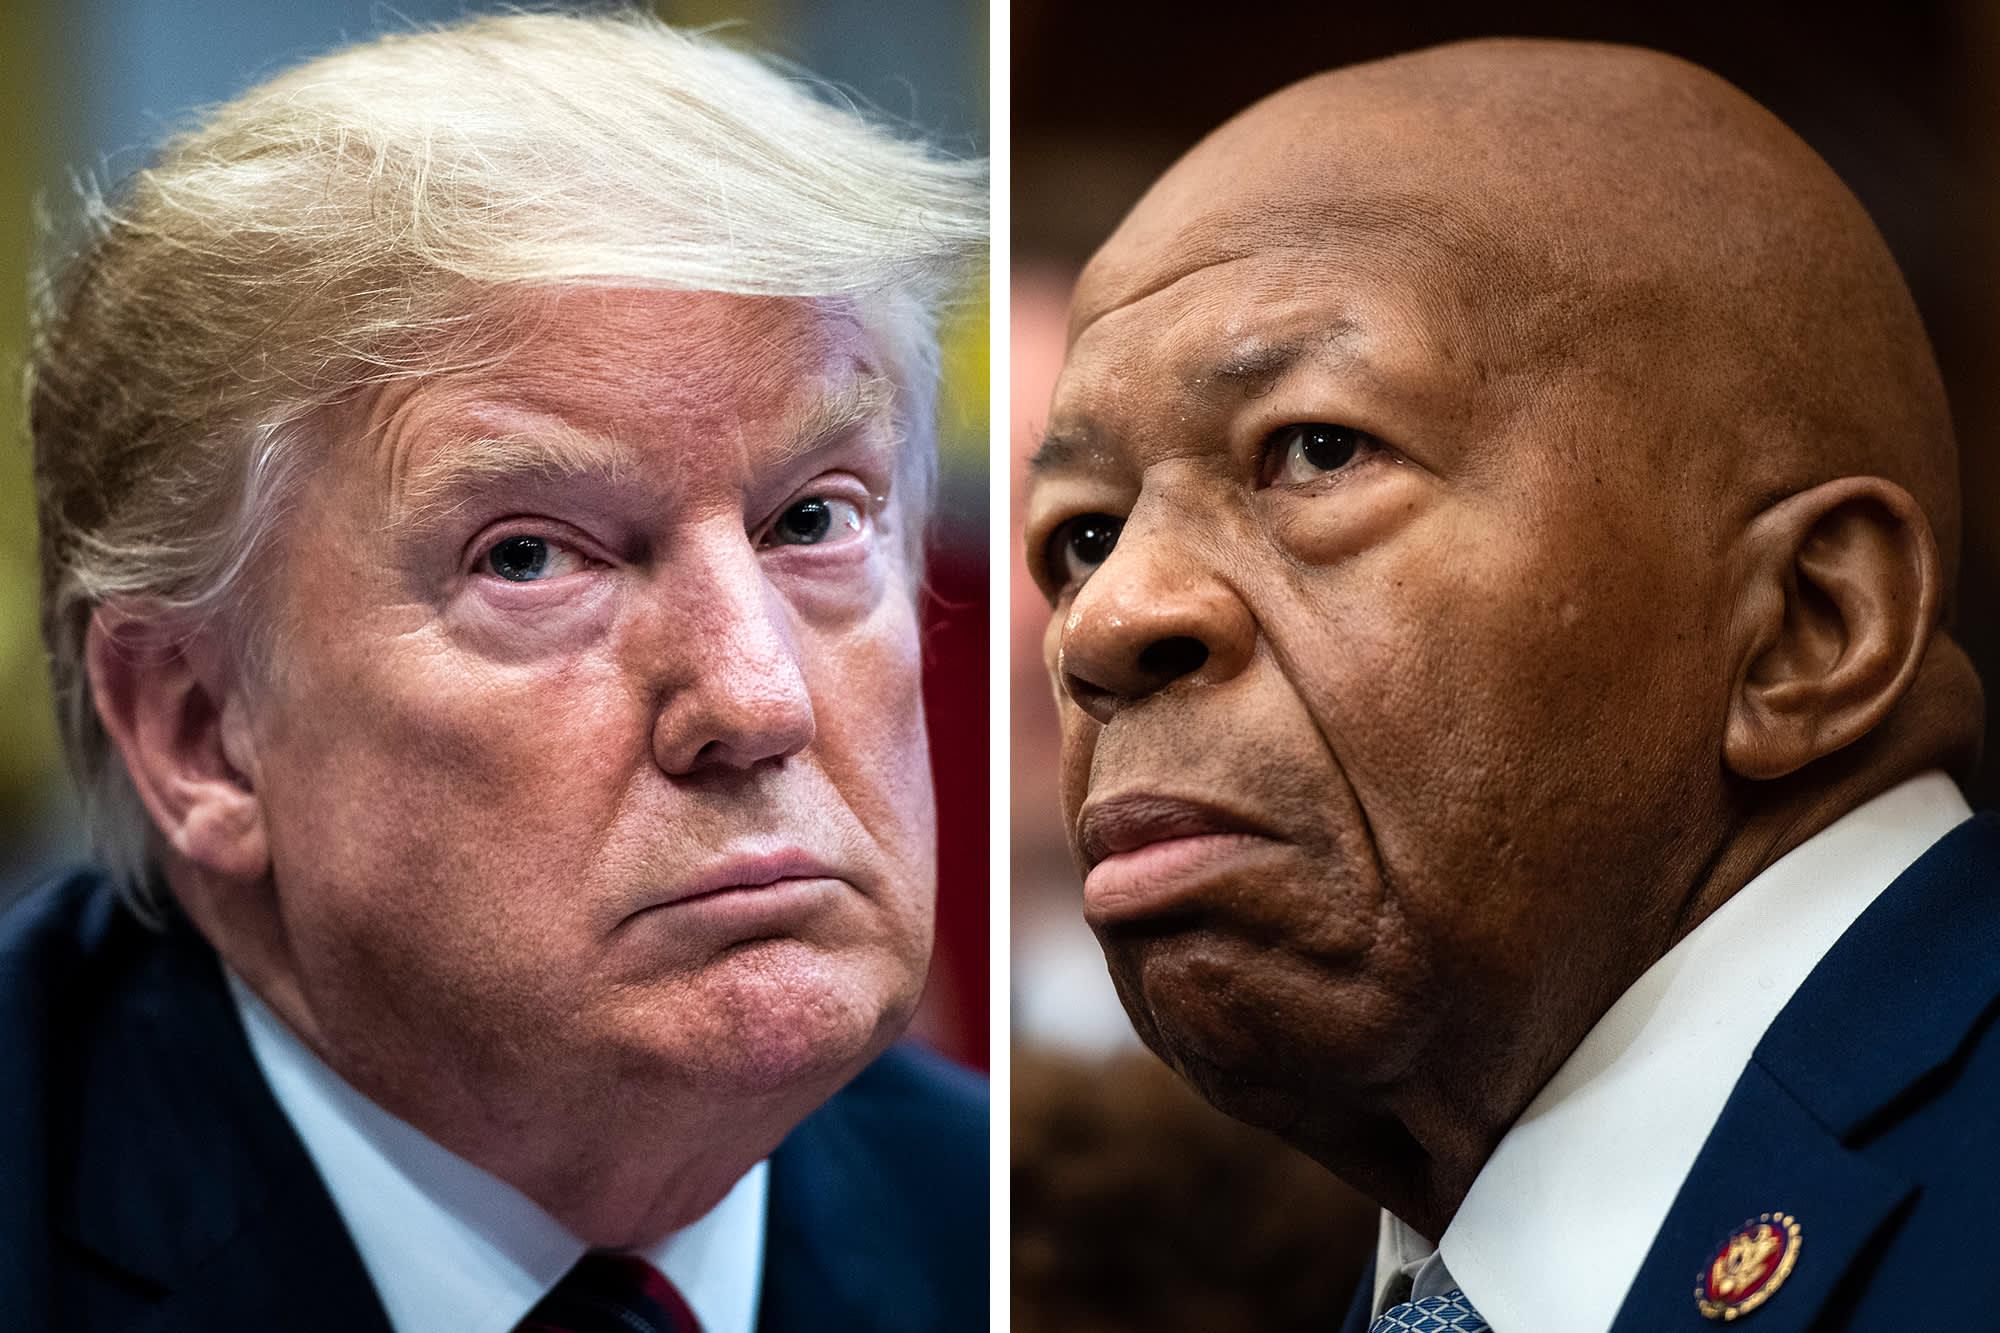 Trump tweets 'too bad!' about burglary attempt at Rep. Elijah Cummings' Baltimore home thumbnail